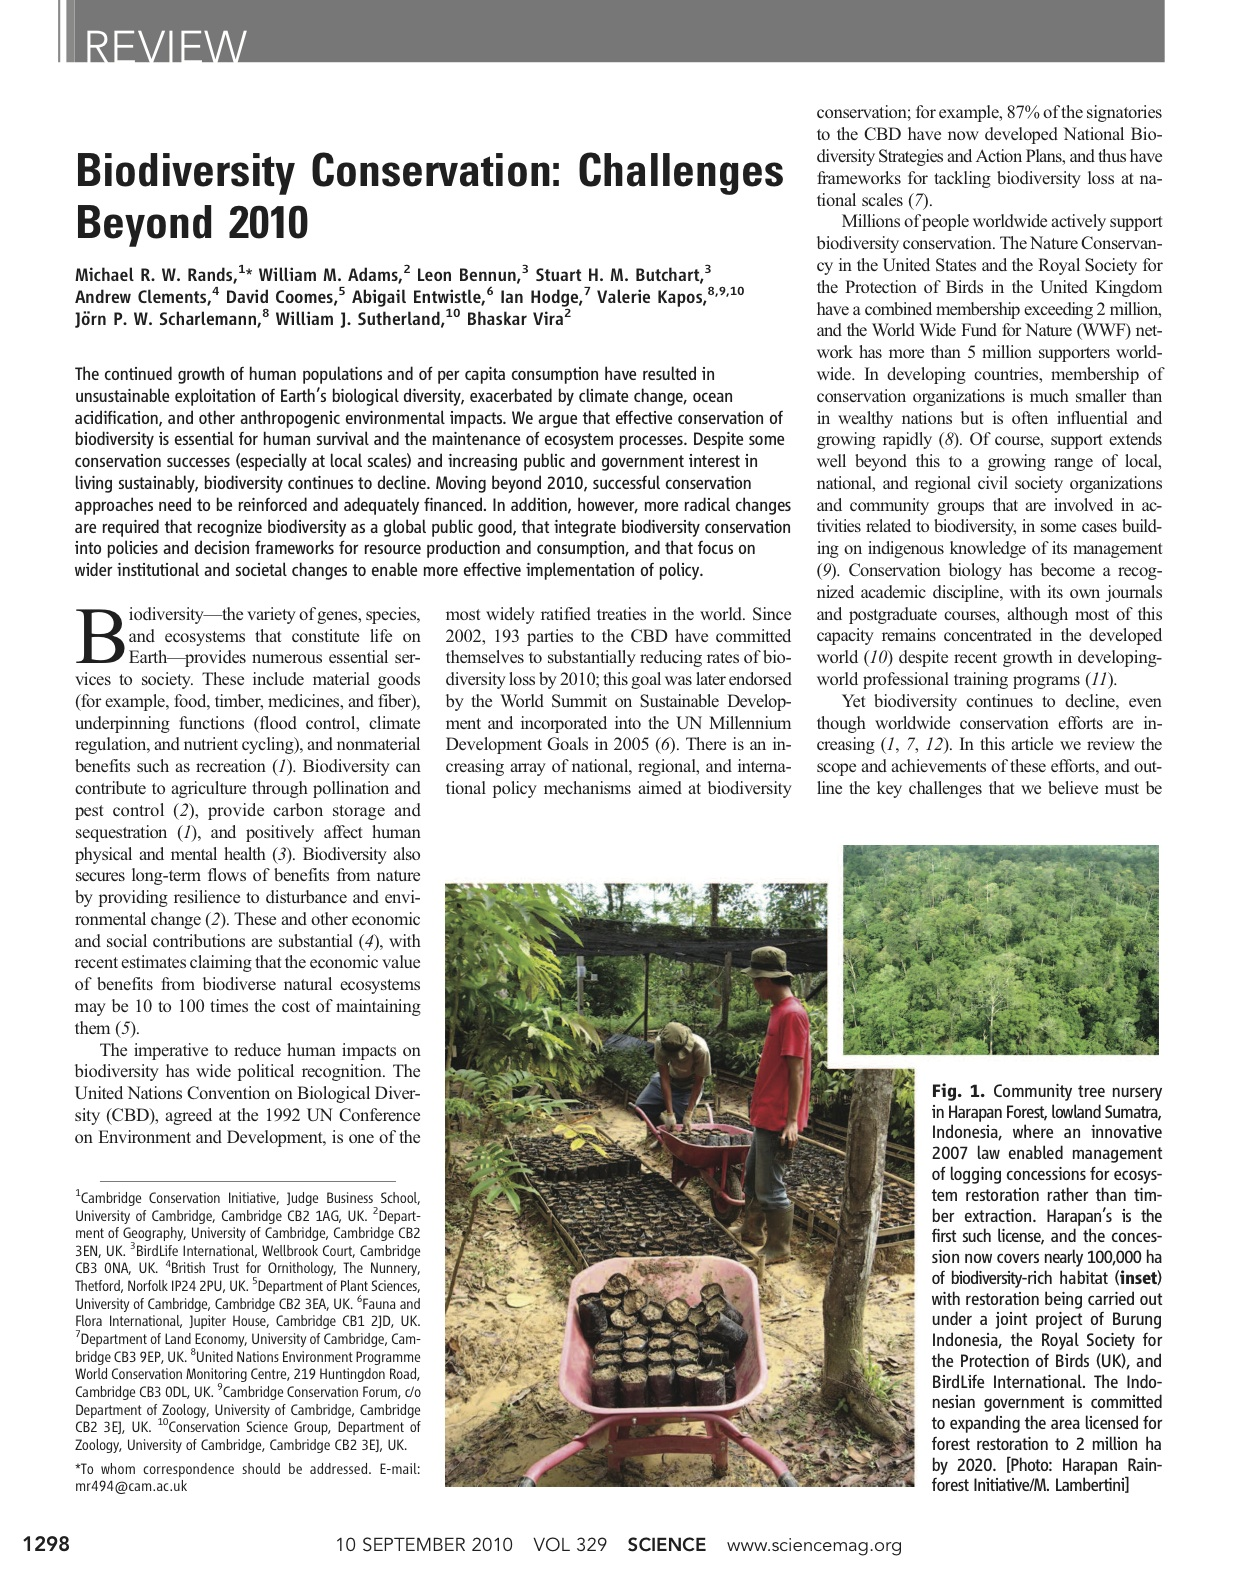 Biodiversity Conservation: Challenges Beyond 2010